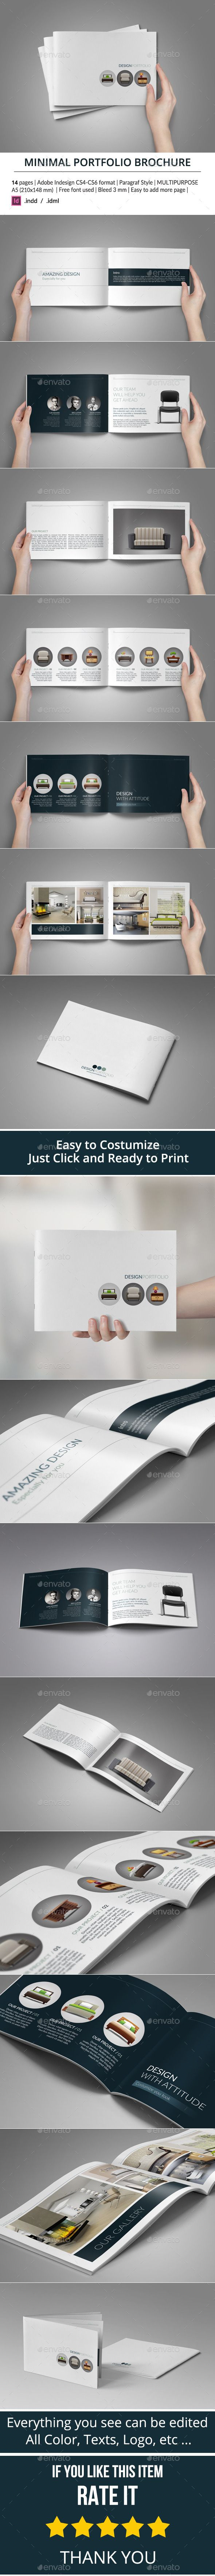 Minimal Portfolio Brochure — InDesign INDD #stylish #horizontal • Available here → https://graphicriver.net/item/minimal-portfolio-brochure/9305493?ref=pxcr